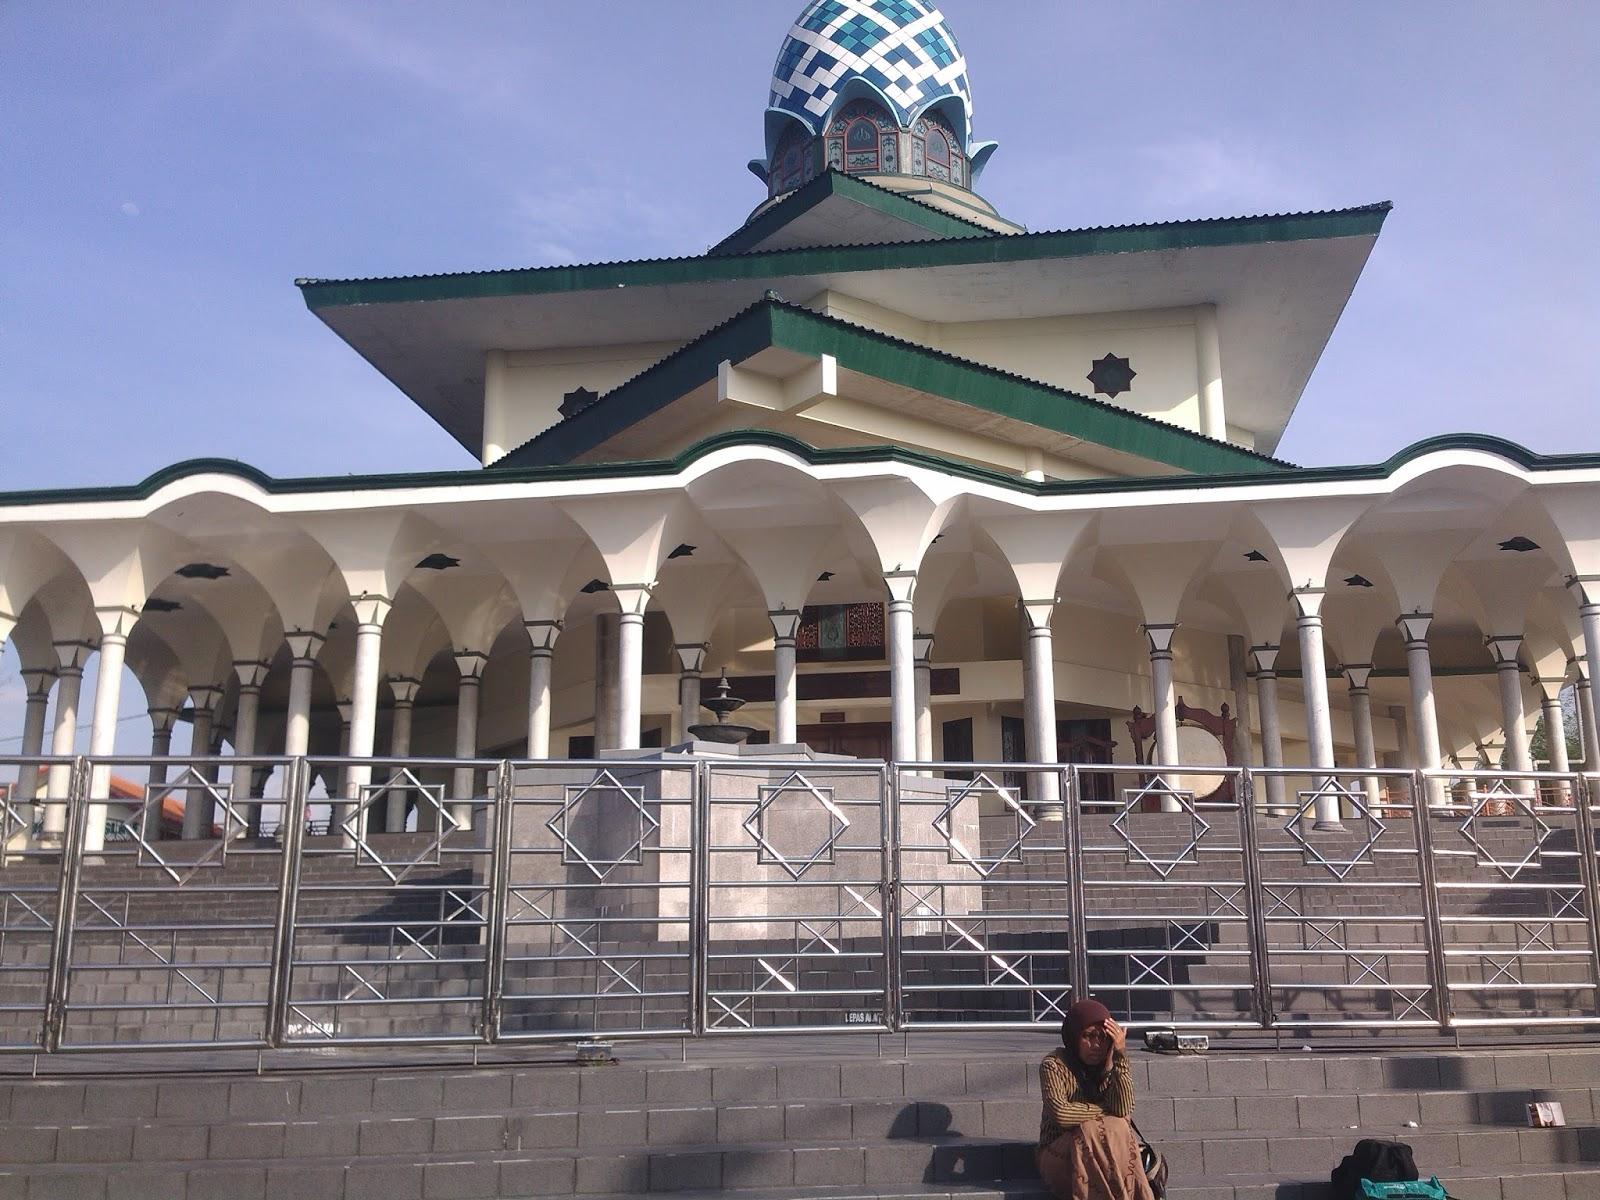 Kediri Religi Masjid Agung Kota Kab